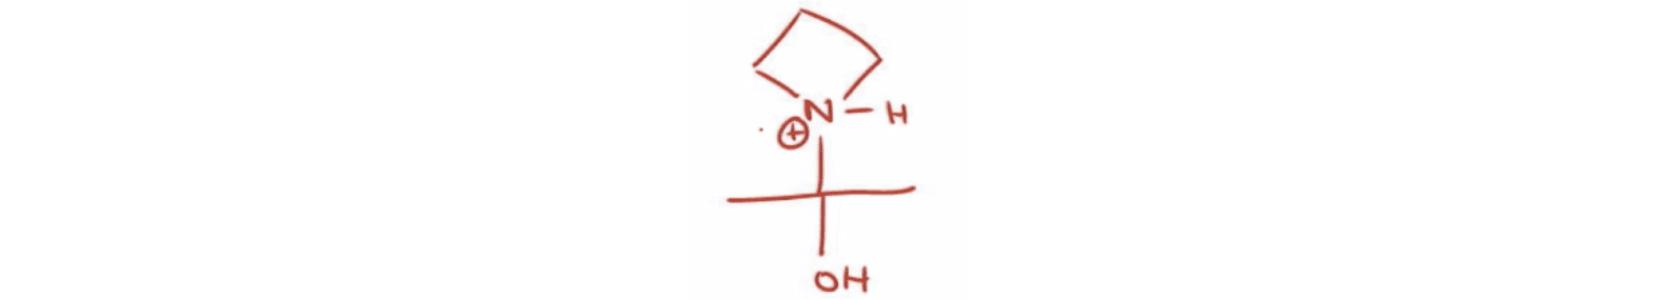 Enamine Tetrahedral Intermediate